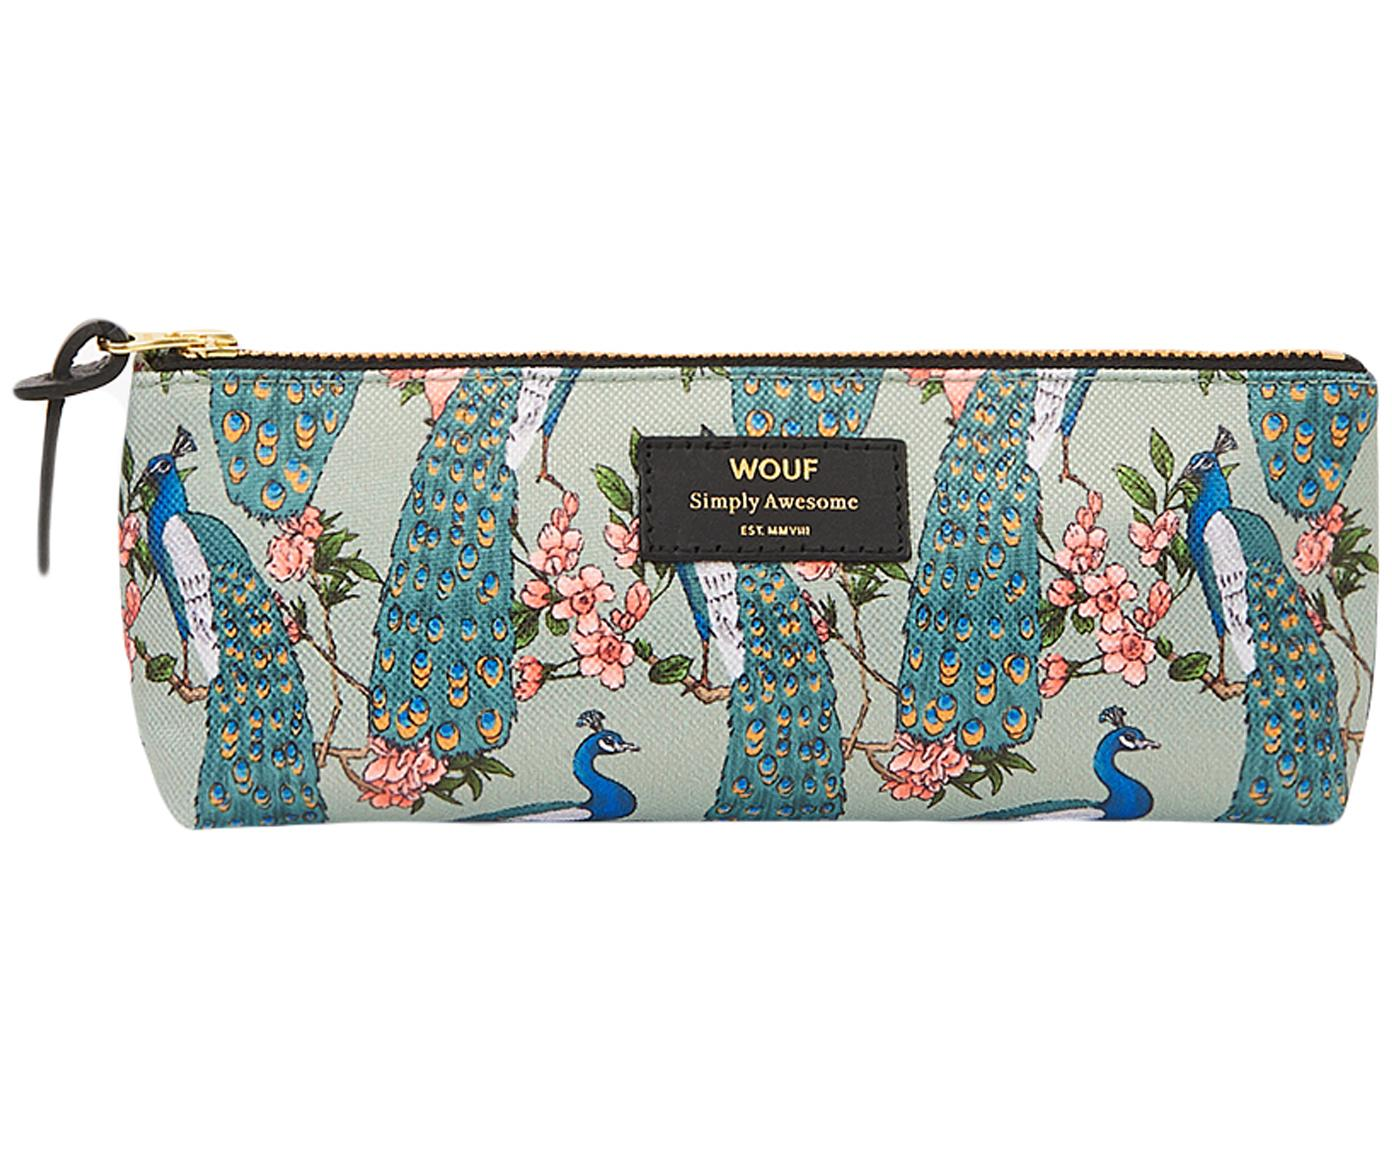 Astuccio per penne Royal Forest, Poliestere, pelle, Multicolore, Larg. 22 x Alt. 9 cm